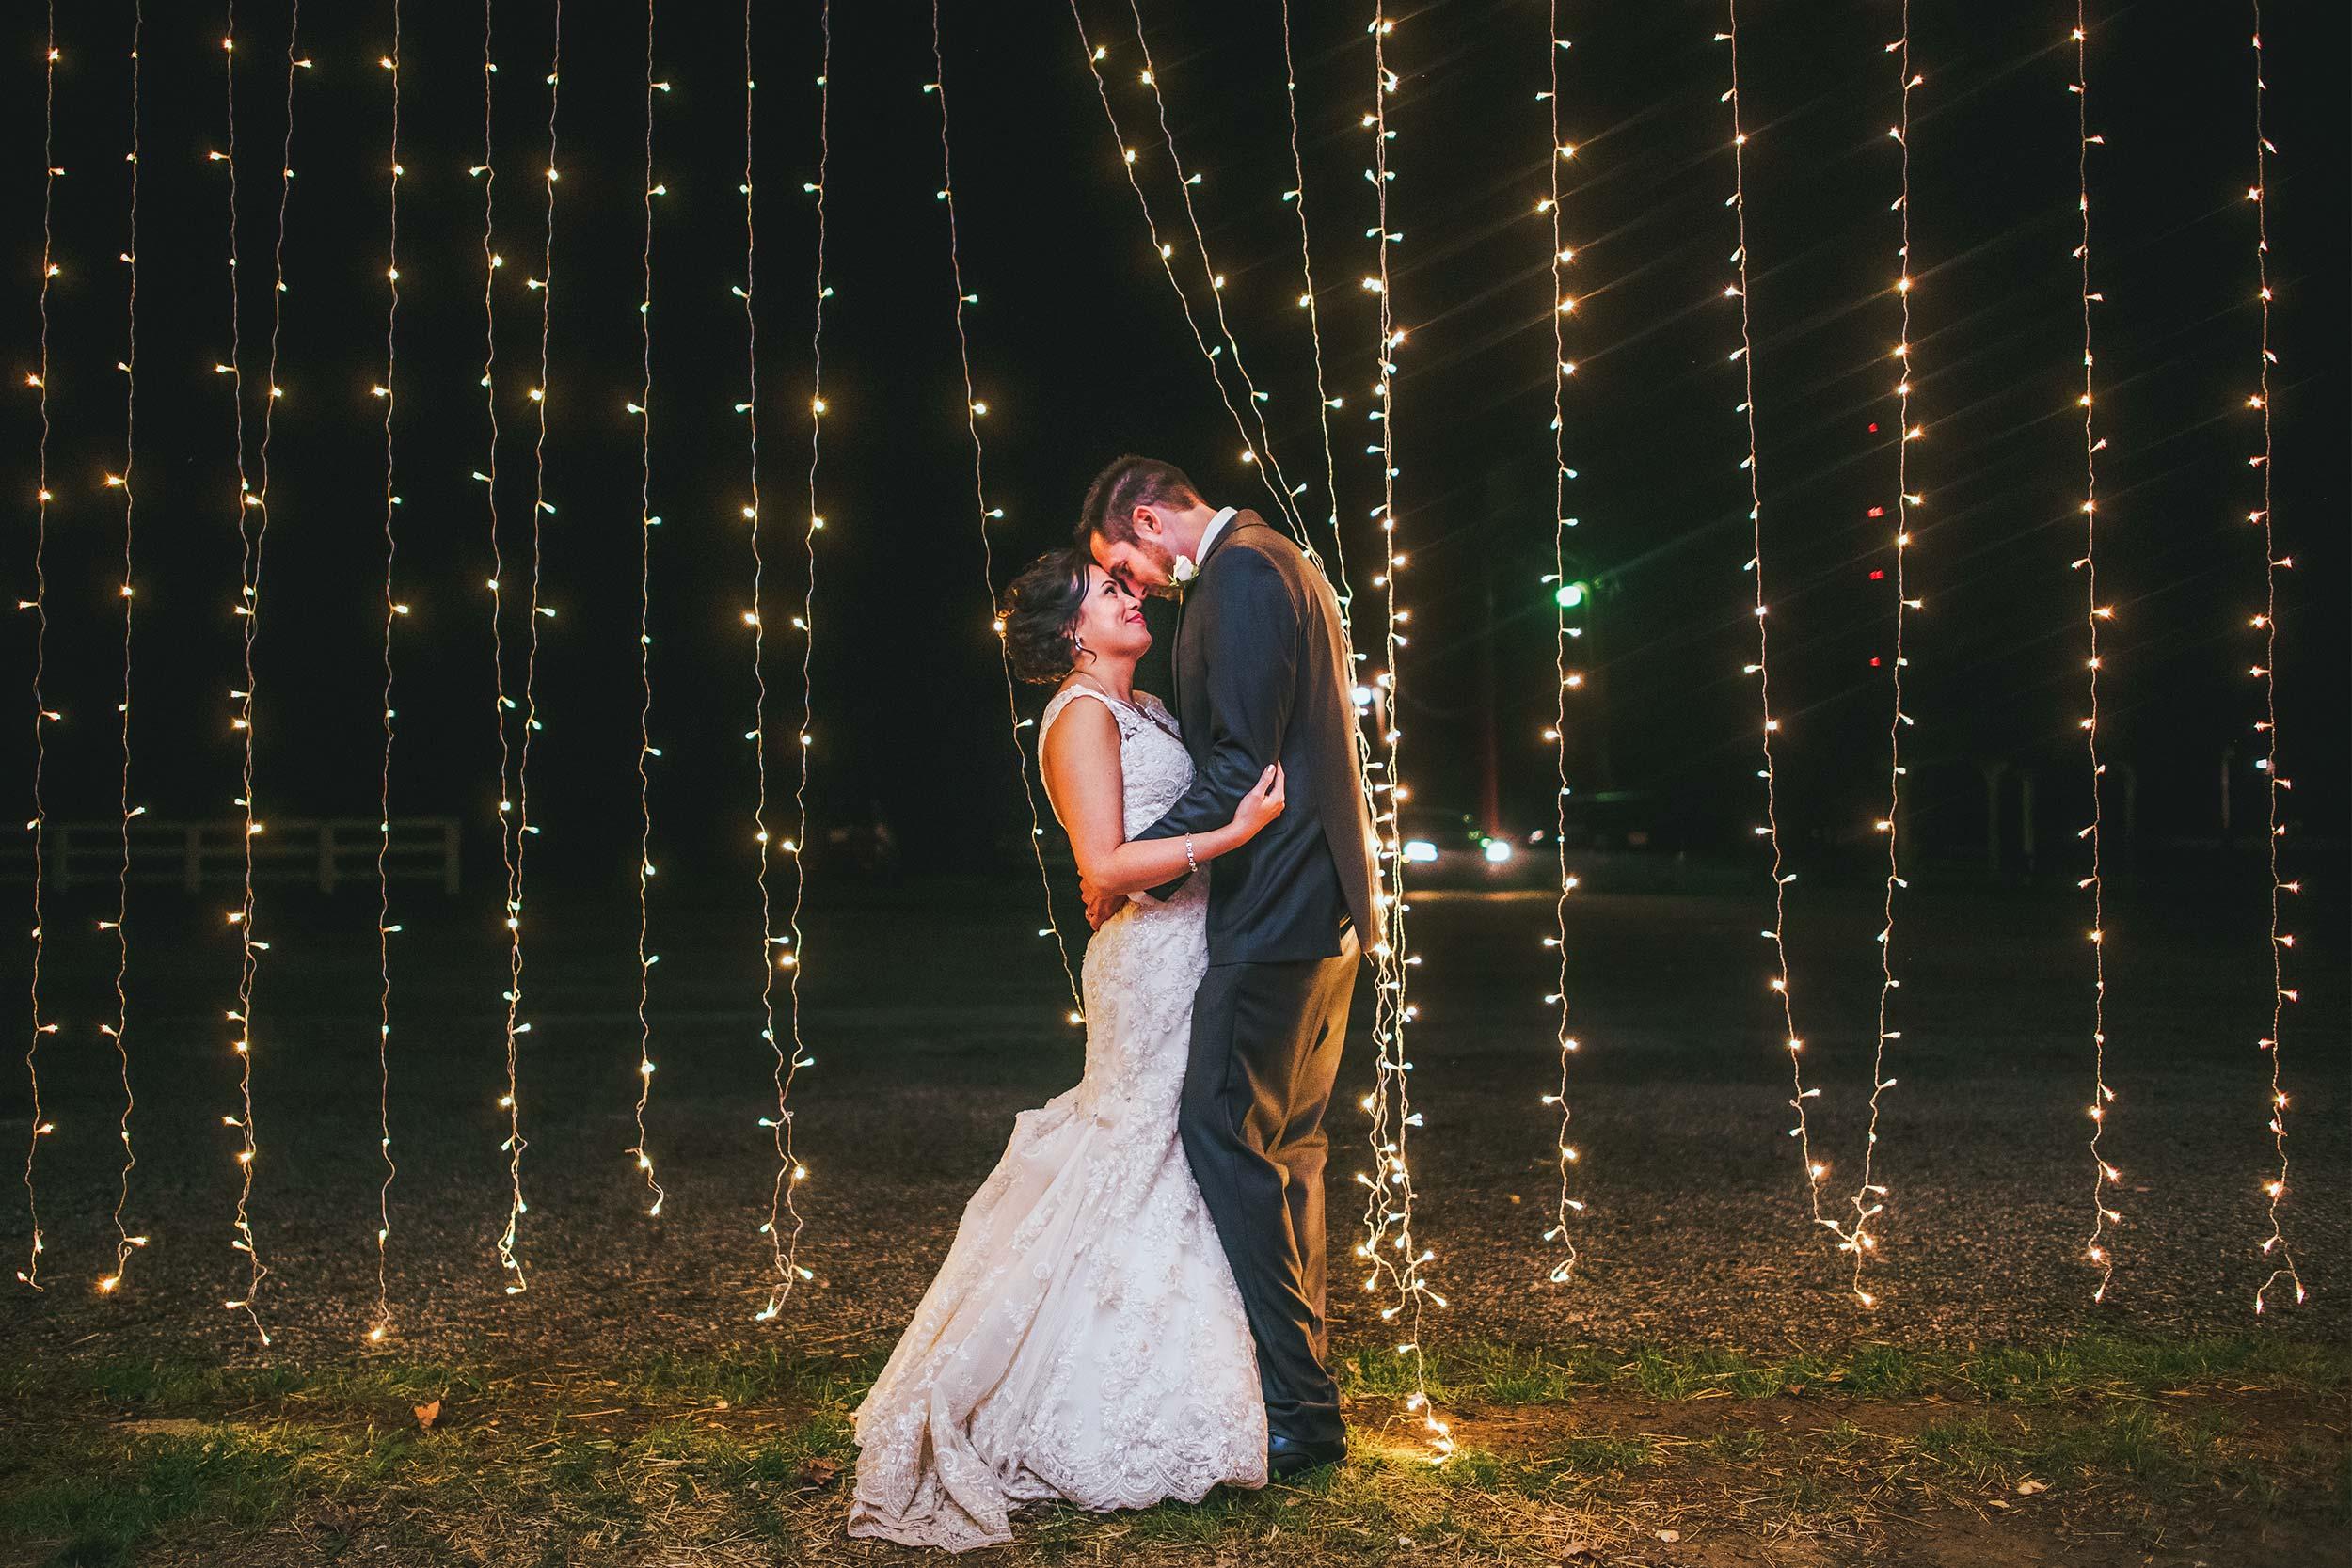 piketon-fairgrounds-string-lights-wedding-portrait.jpg